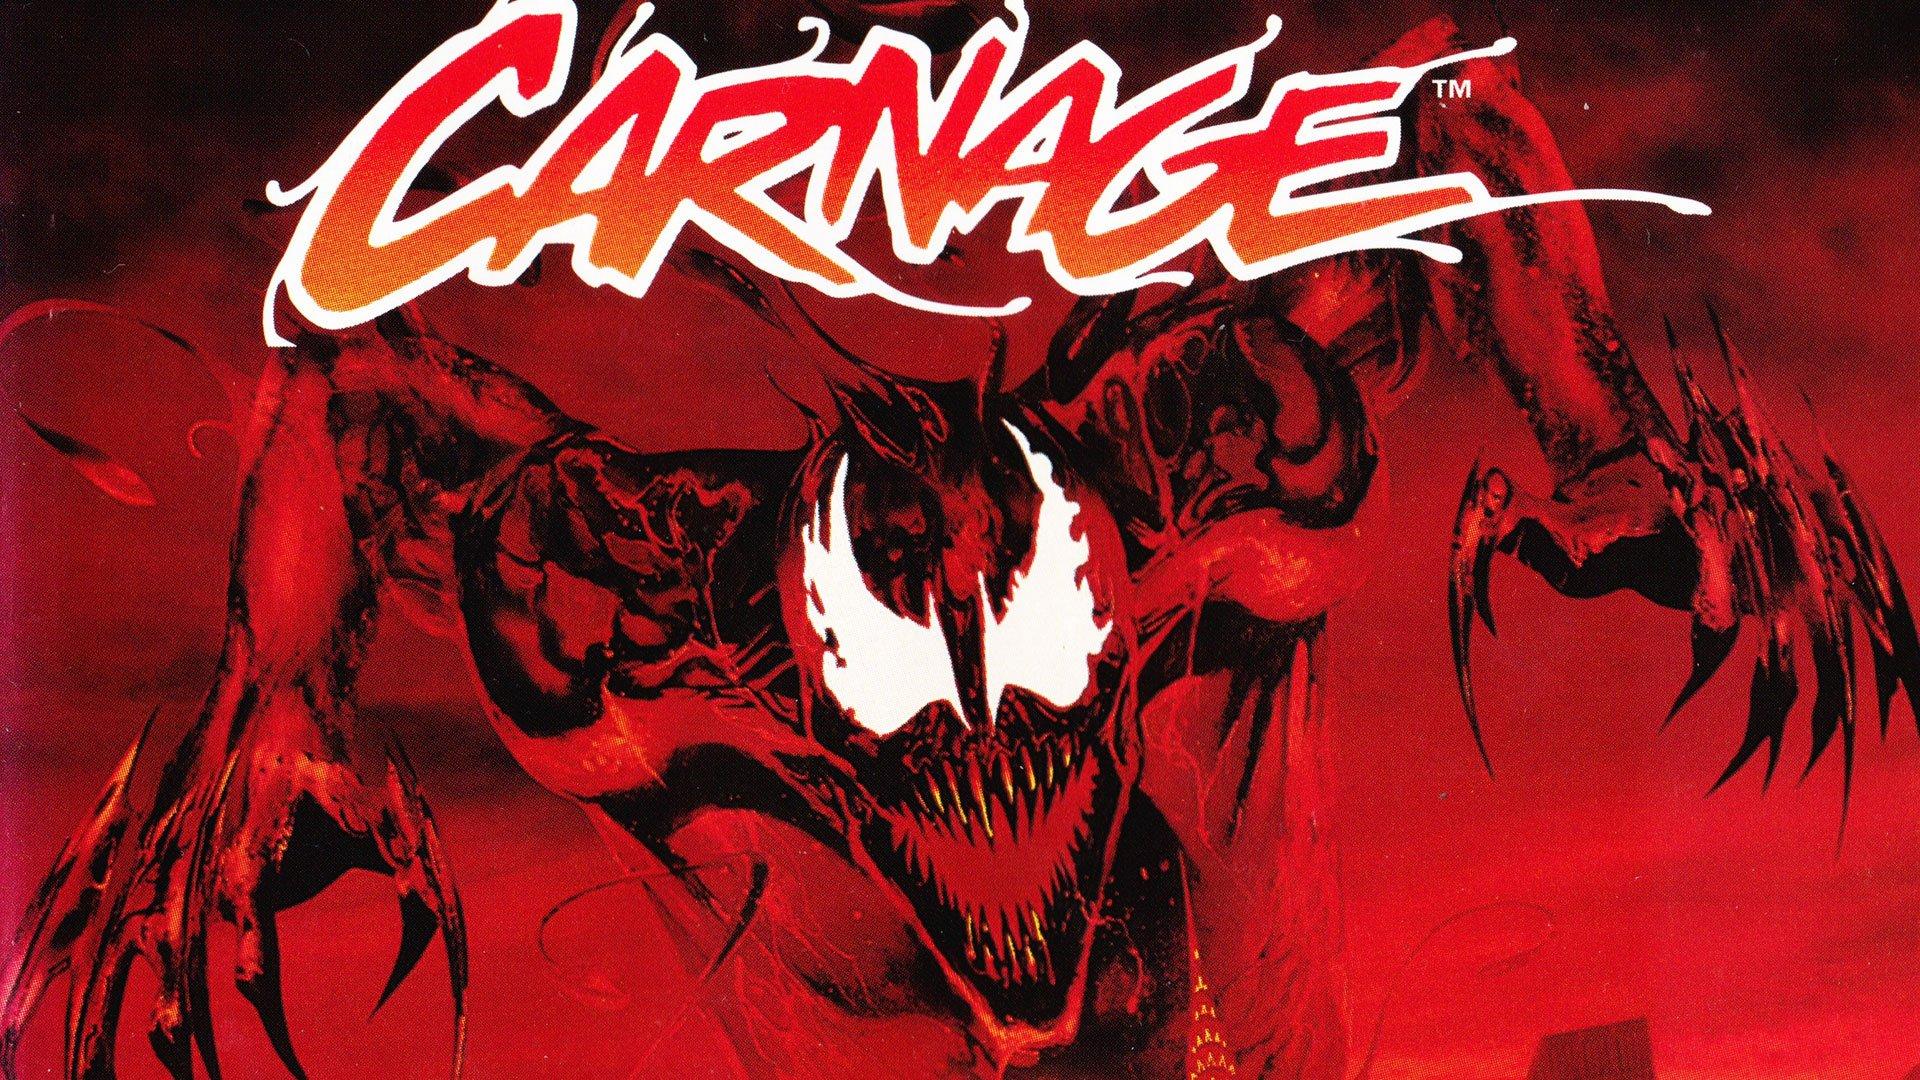 maximum carnage wallpaper - photo #3